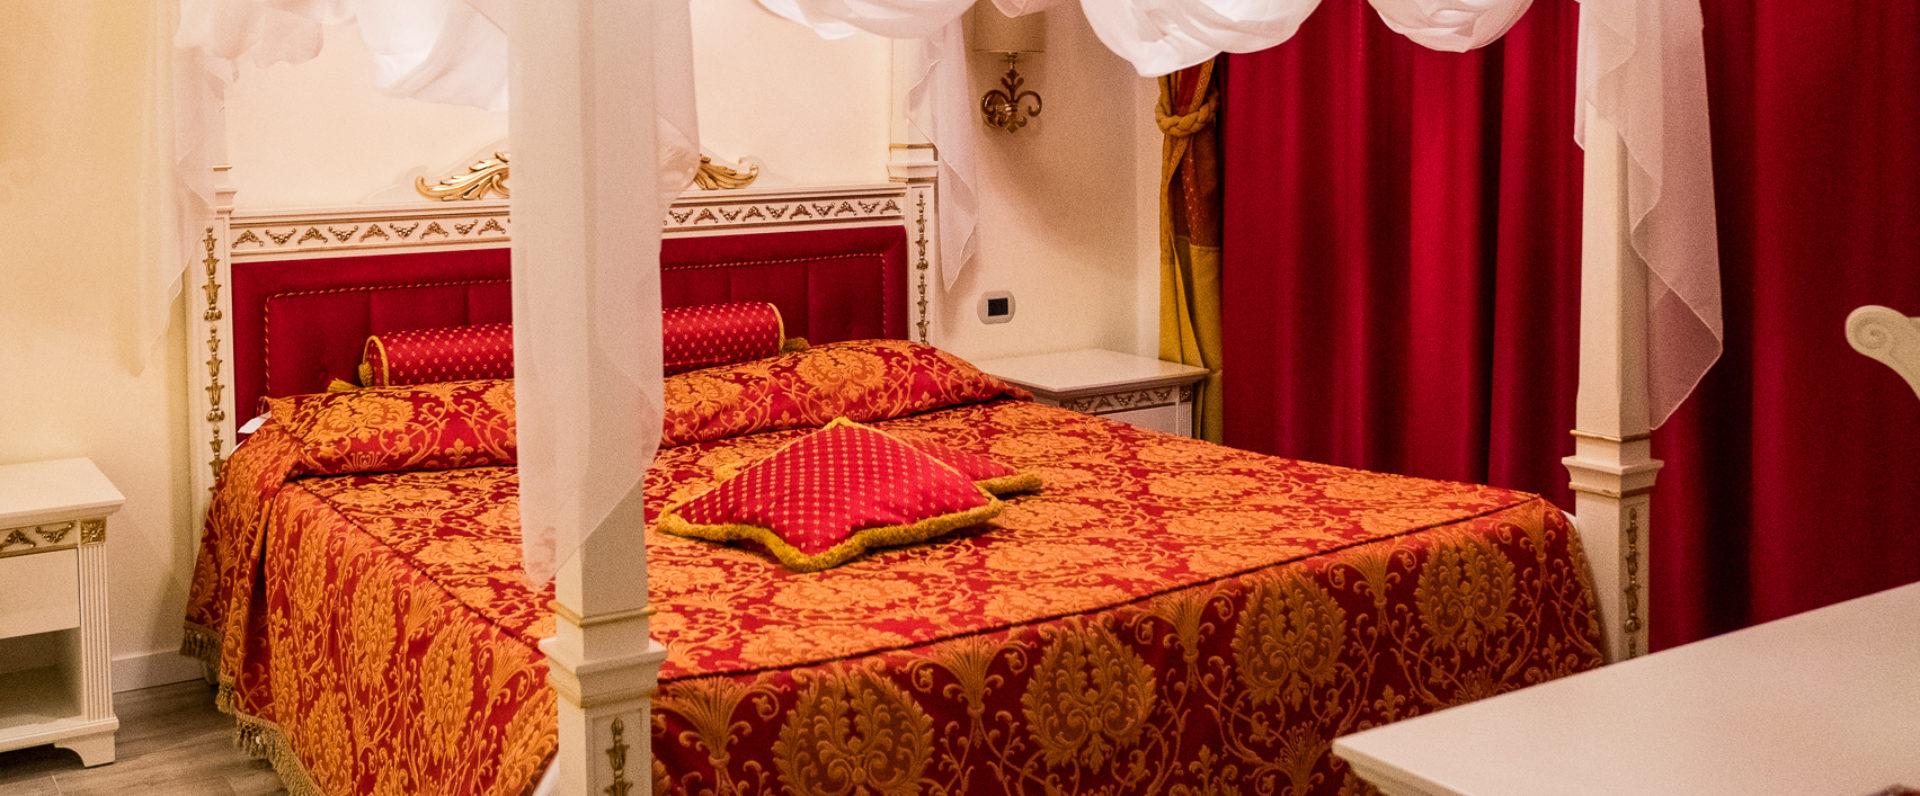 Palace Hotel Vicenza